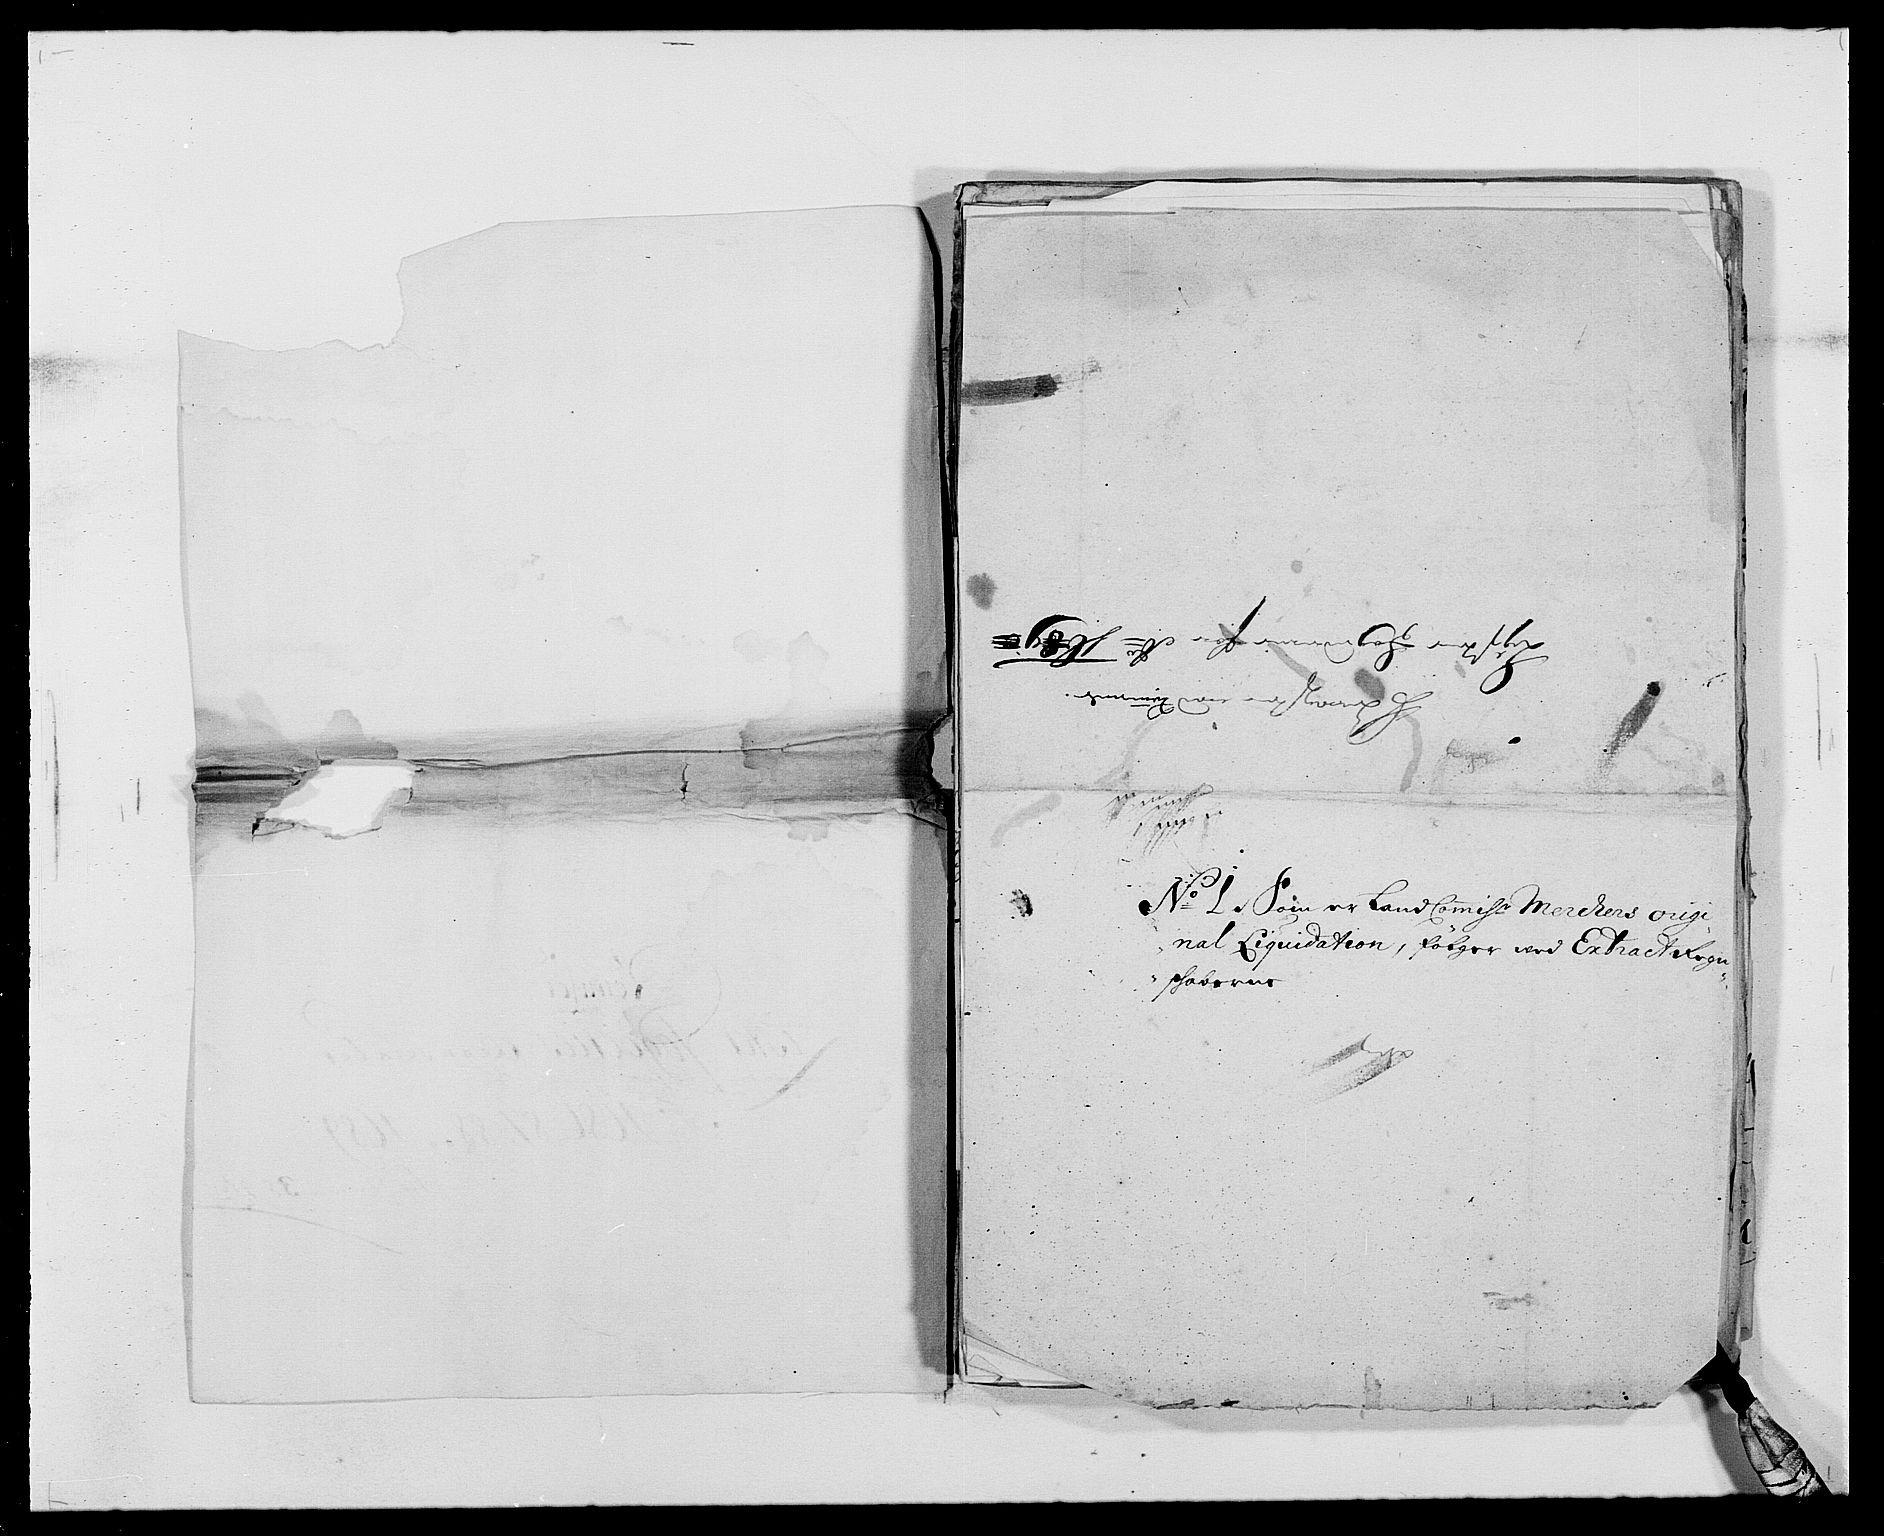 RA, Rentekammeret inntil 1814, Reviderte regnskaper, Fogderegnskap, R41/L2535: Fogderegnskap Lista, 1686-1689, s. 37